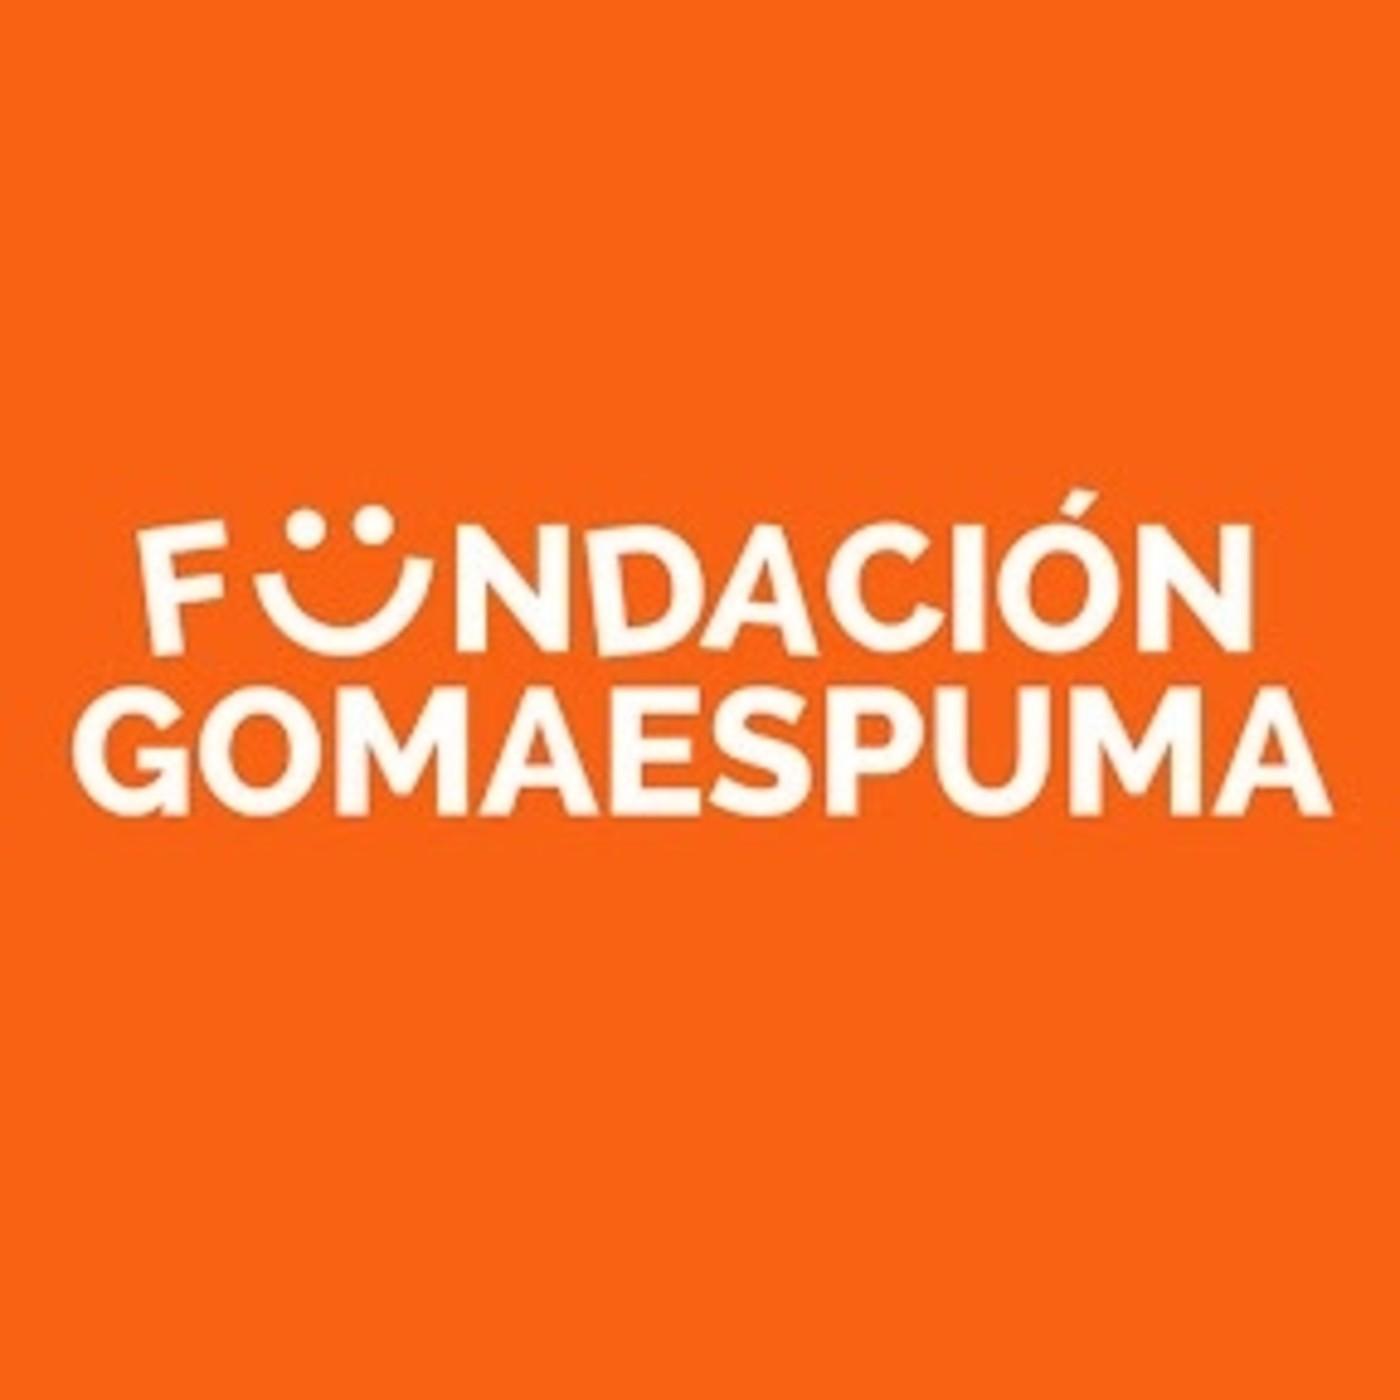 FUNDACION GOMAESPUMA